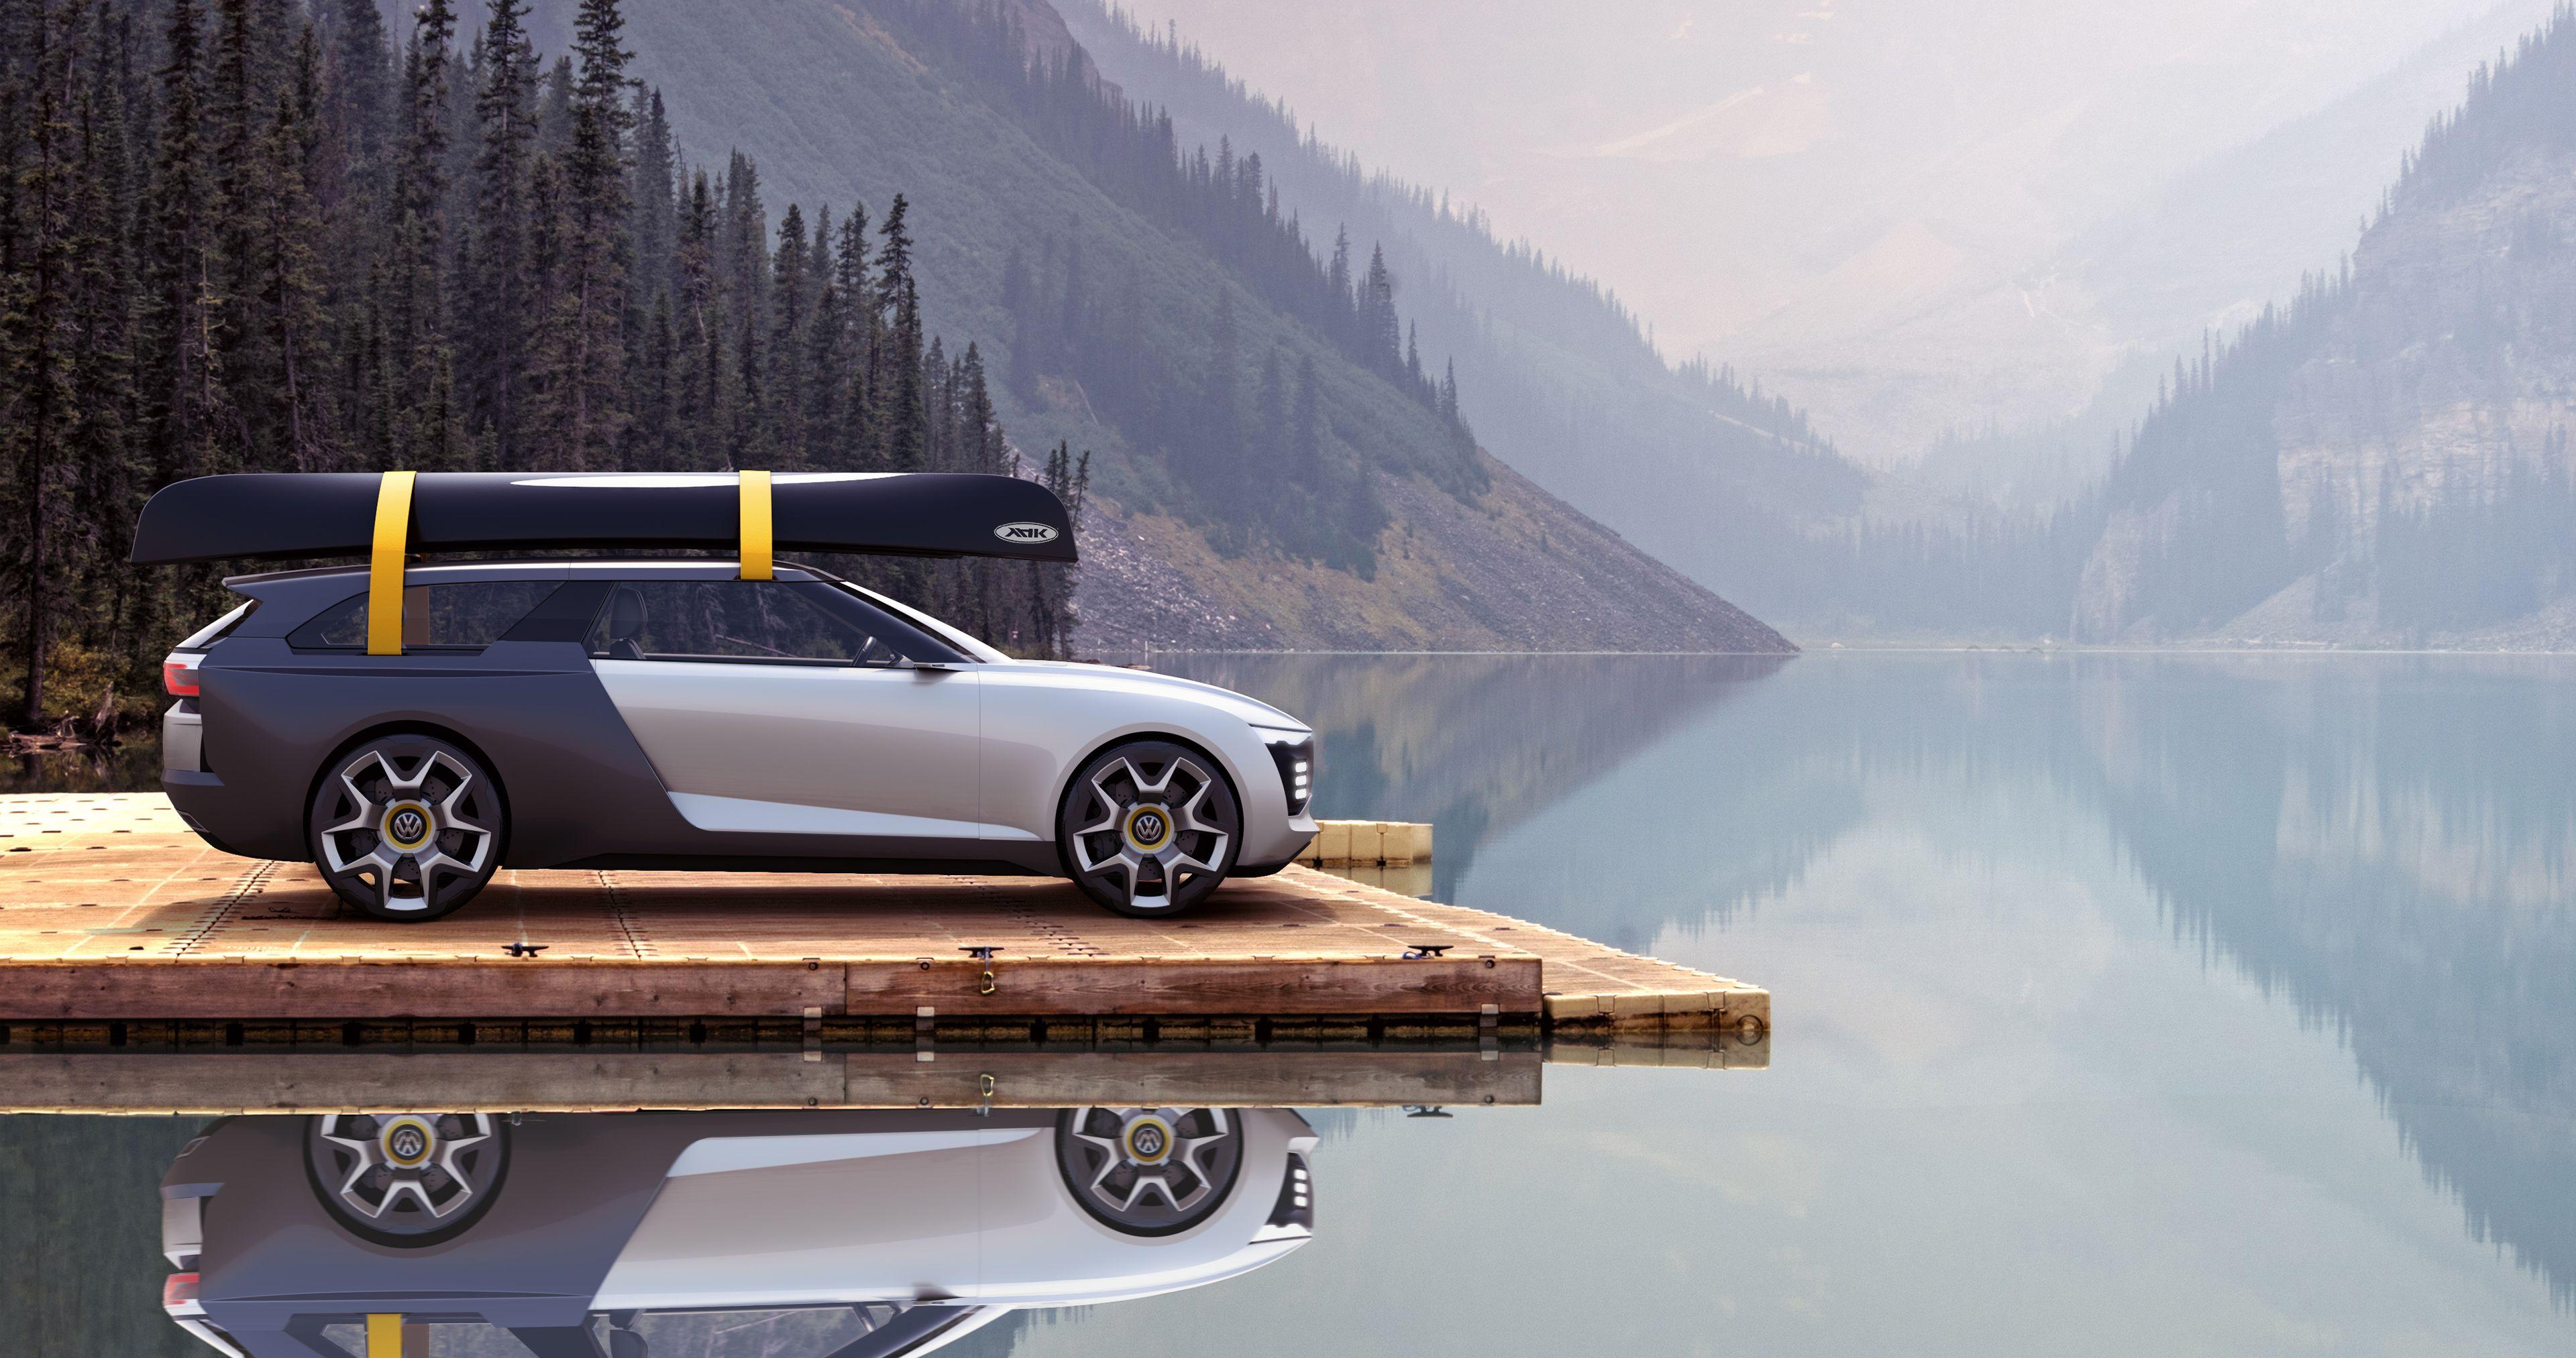 Volkswagen Varok : Australian pickupDesigned during internship at Volkswagen Design : Valentin FUCHS3D modeling & Vred Rendering : Pierre Joveneaux